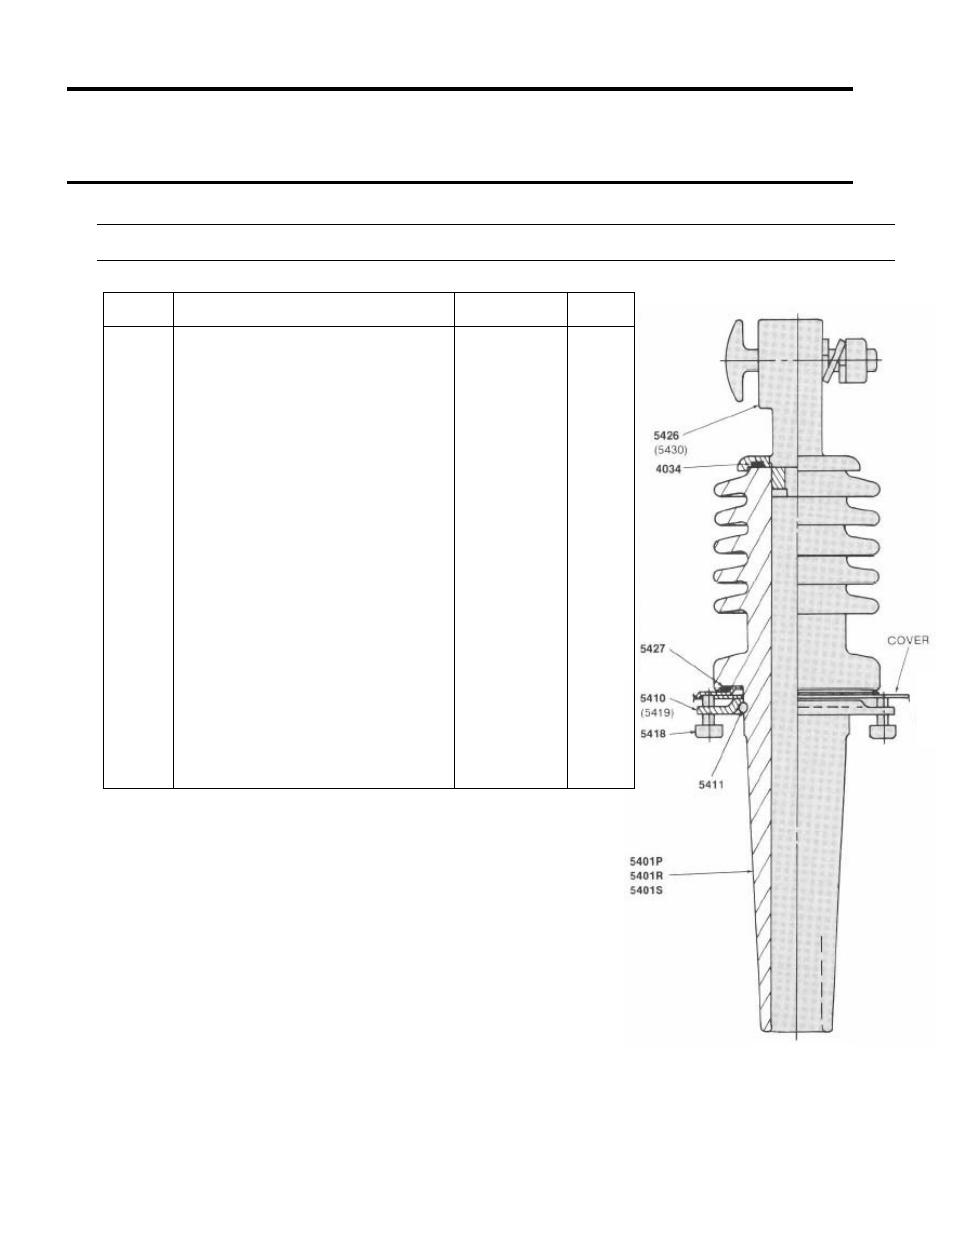 medium resolution of parts list siemens jfr distribution step voltage regulator 21 115532 001 user manual page 26 28